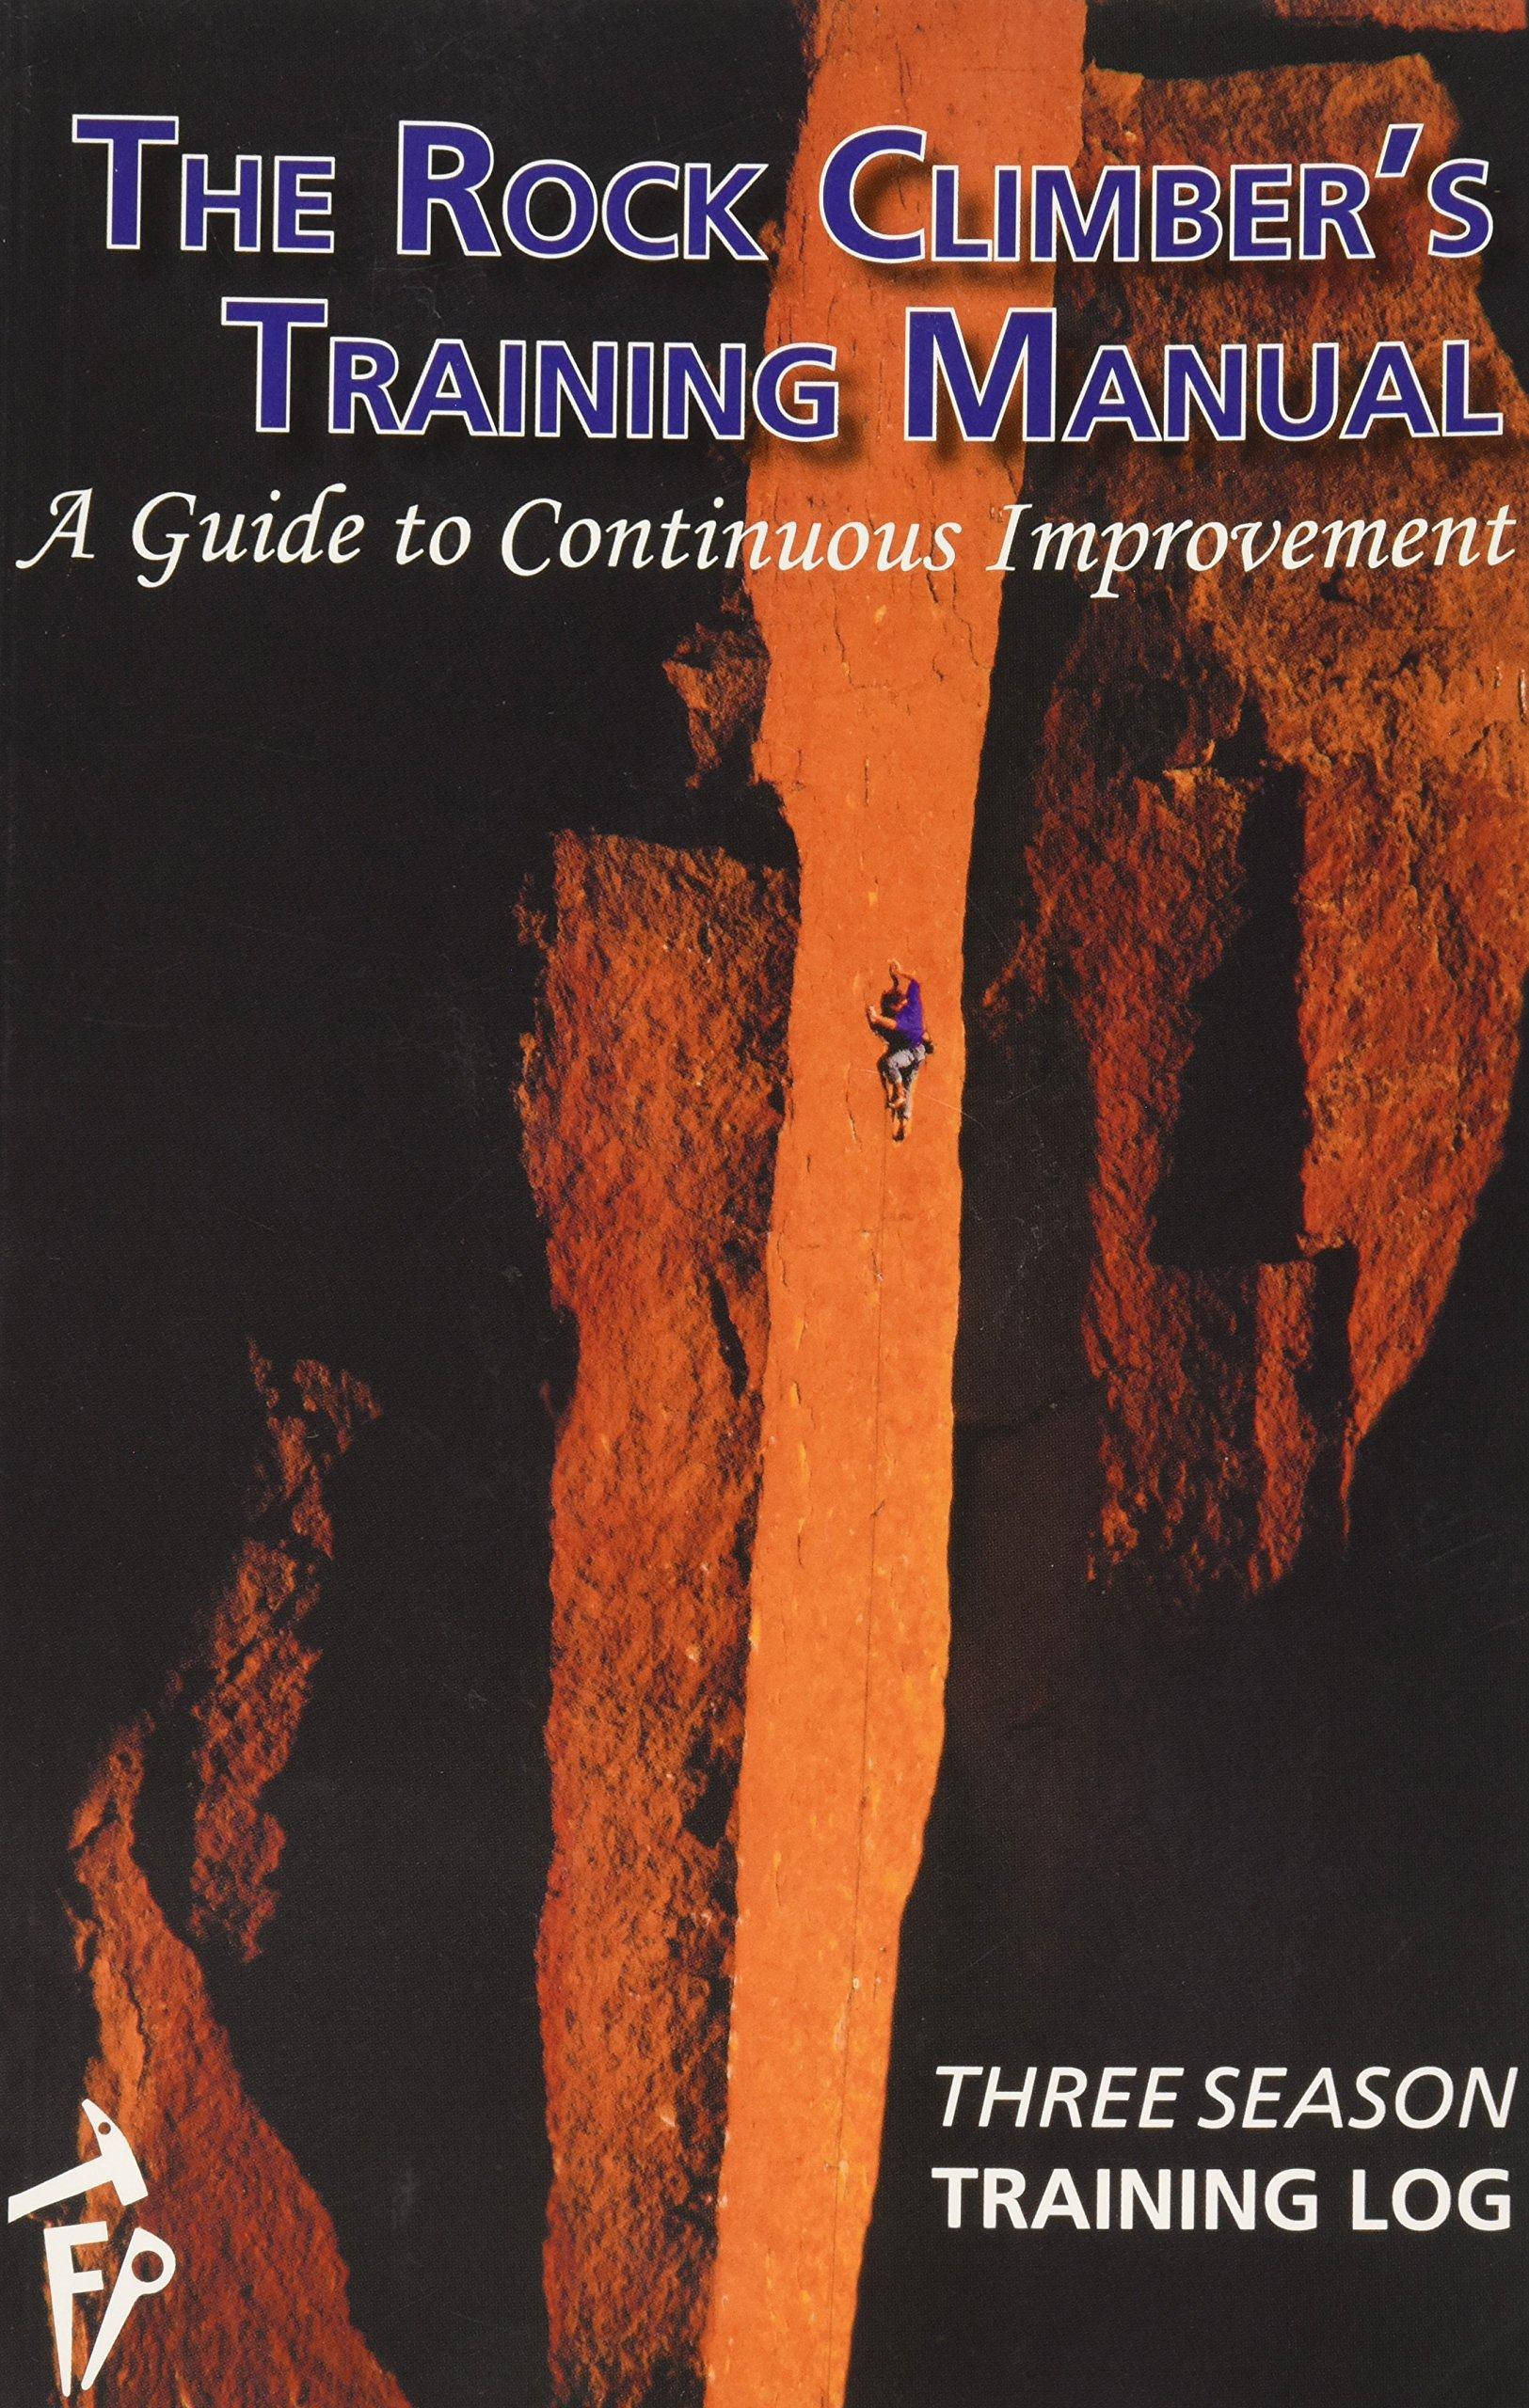 The Rock Climber's Training Manual   Three Season Training Log: Michael L  Anderson, Mark Anderson: 9780989515627: Amazon.com: Books